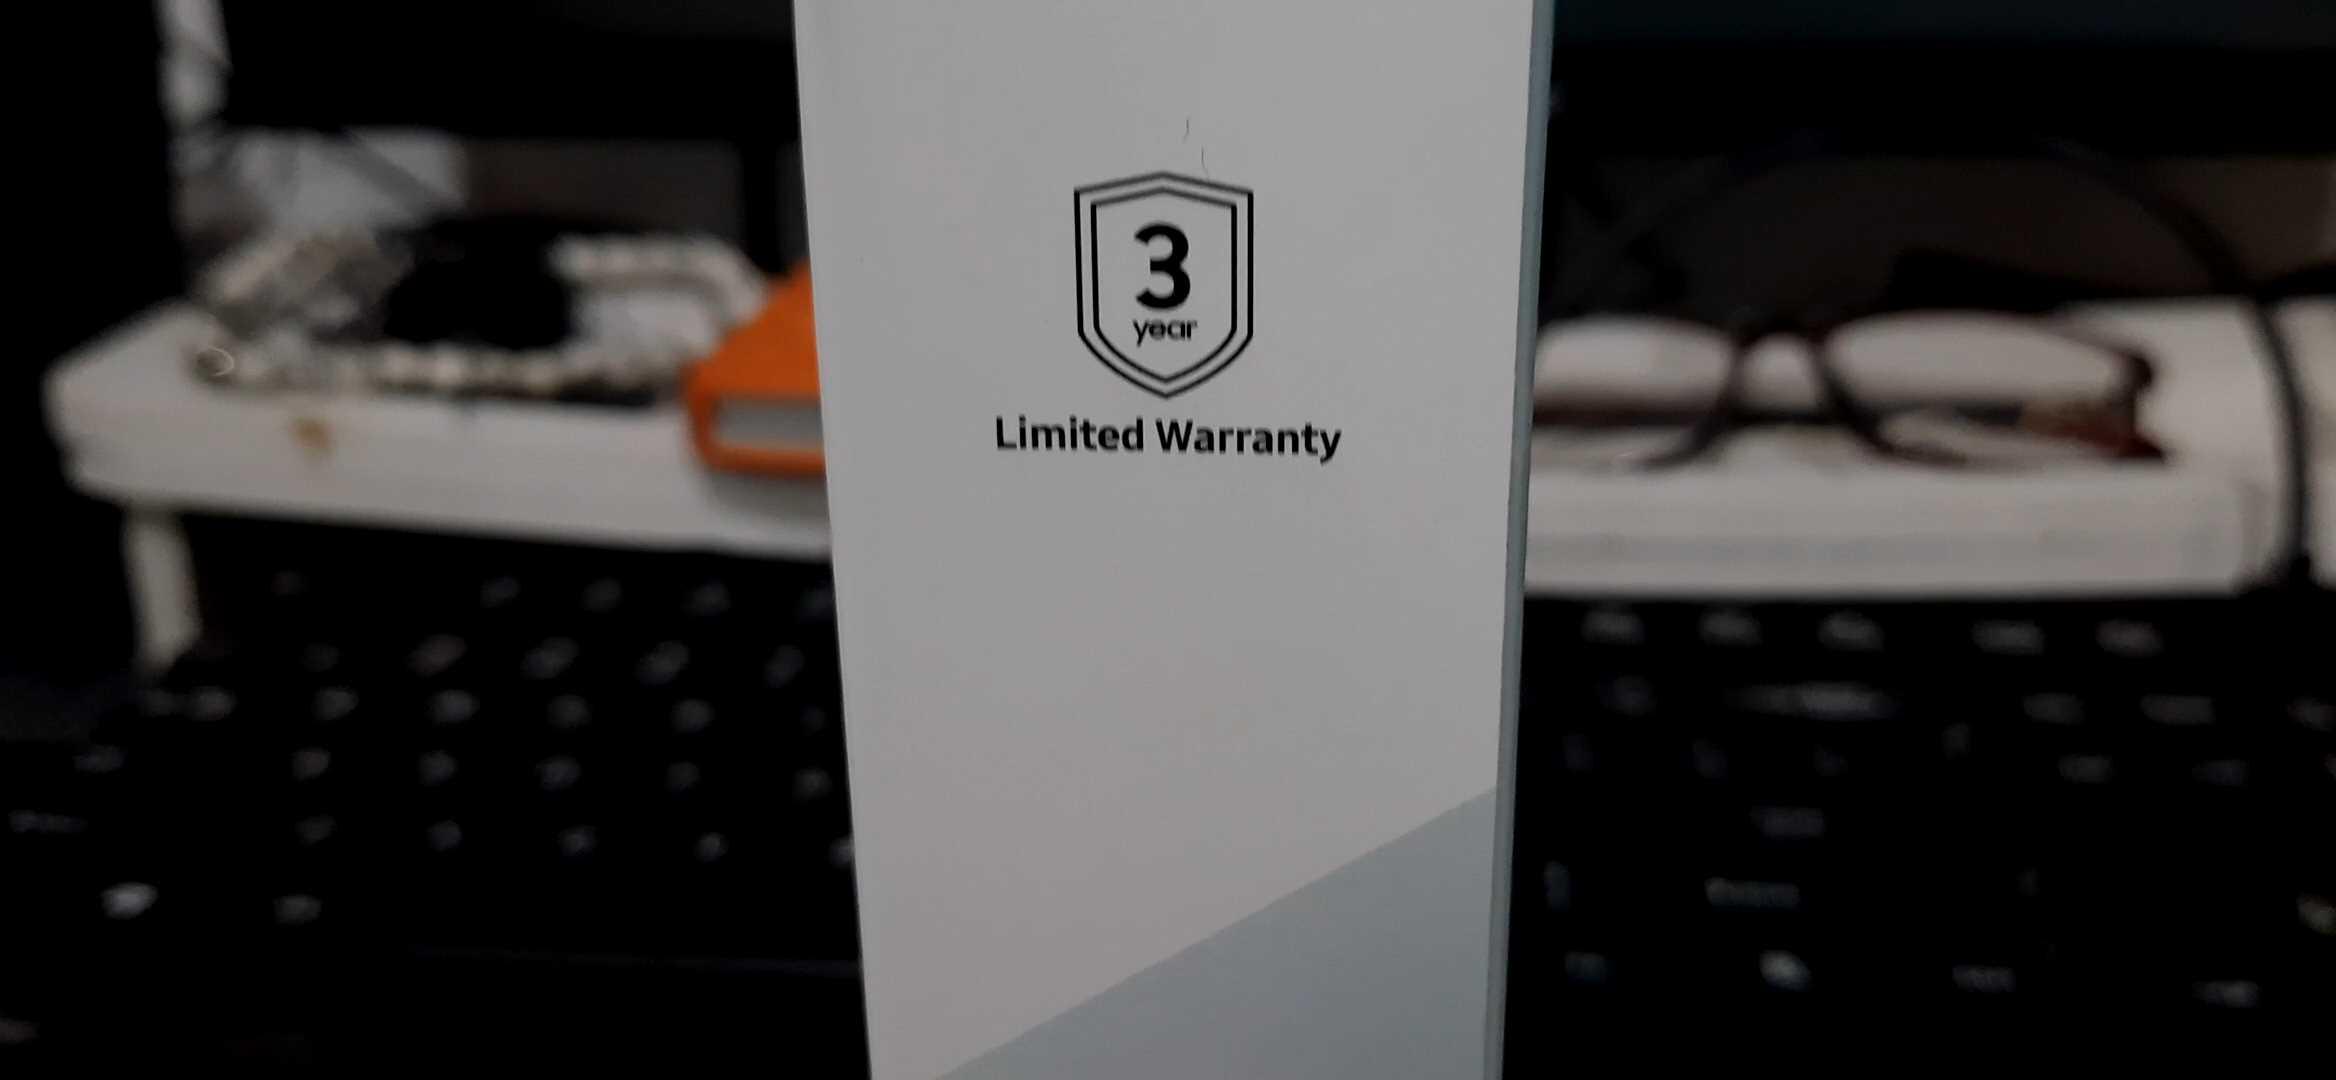 Samsung Portable SSD T5 Warranty 3 Years